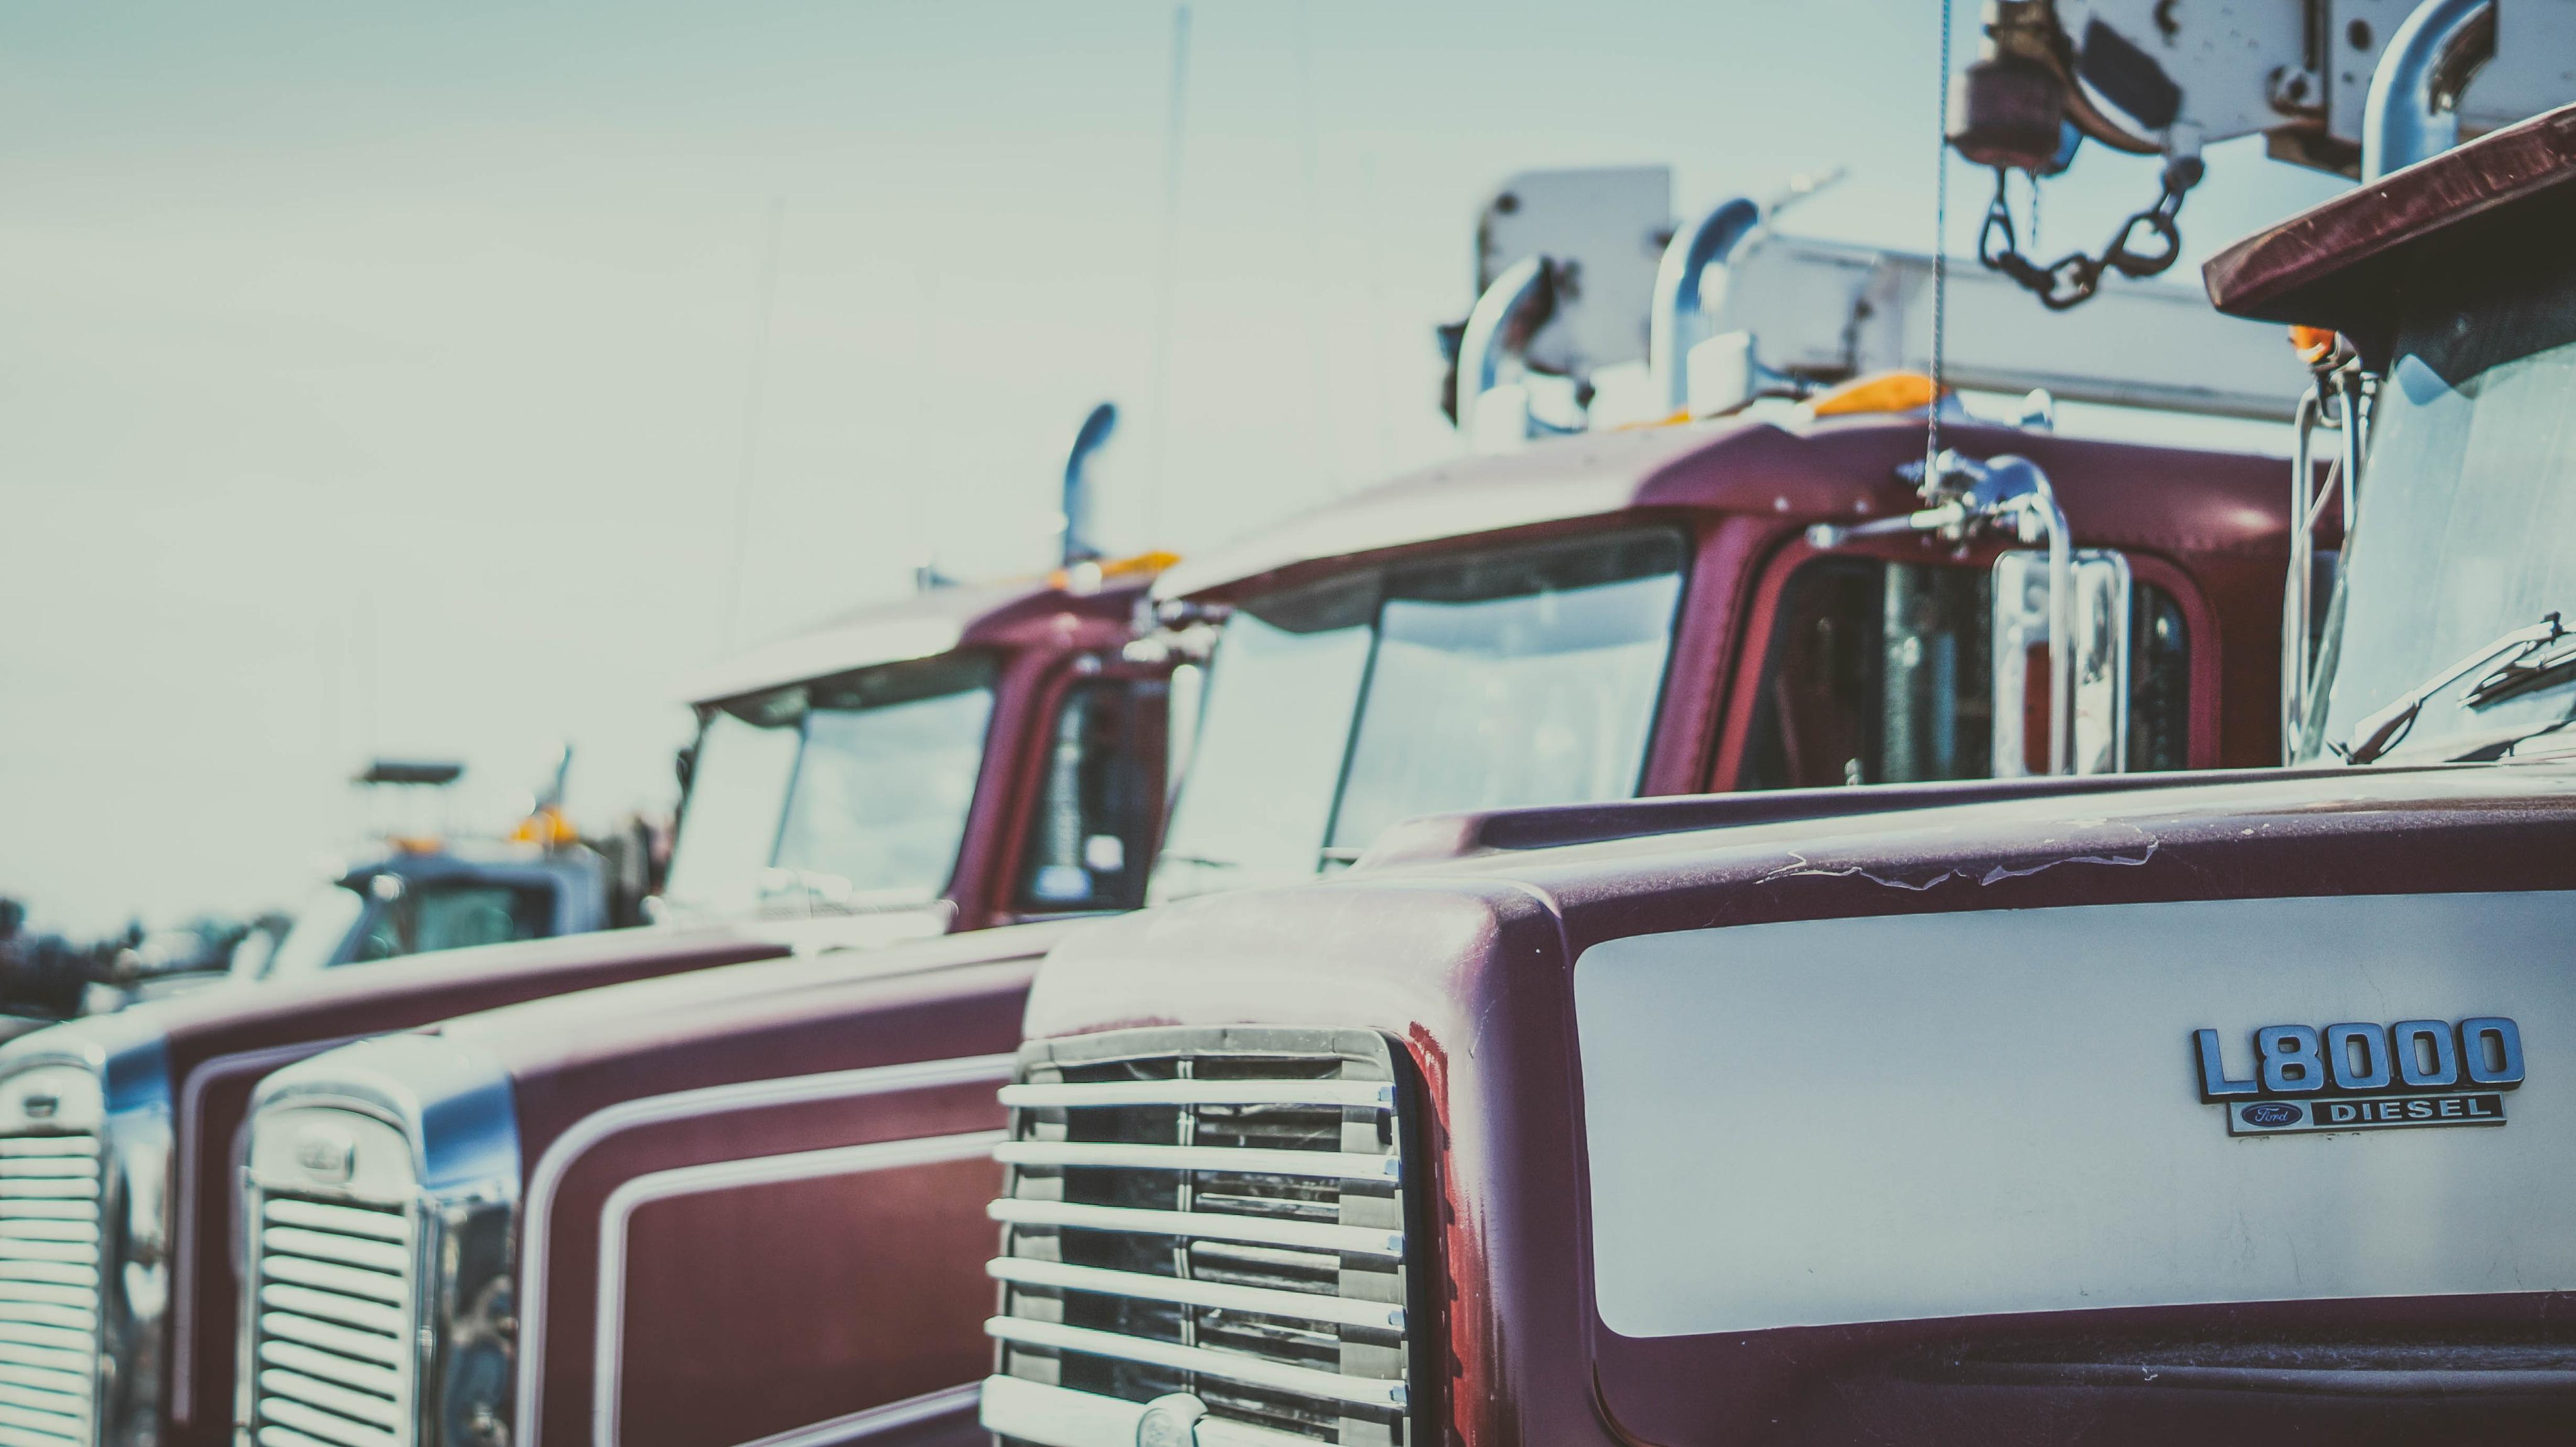 Alaskan Equipment | Heavy Equipments, Heavy trucks and Transport ...